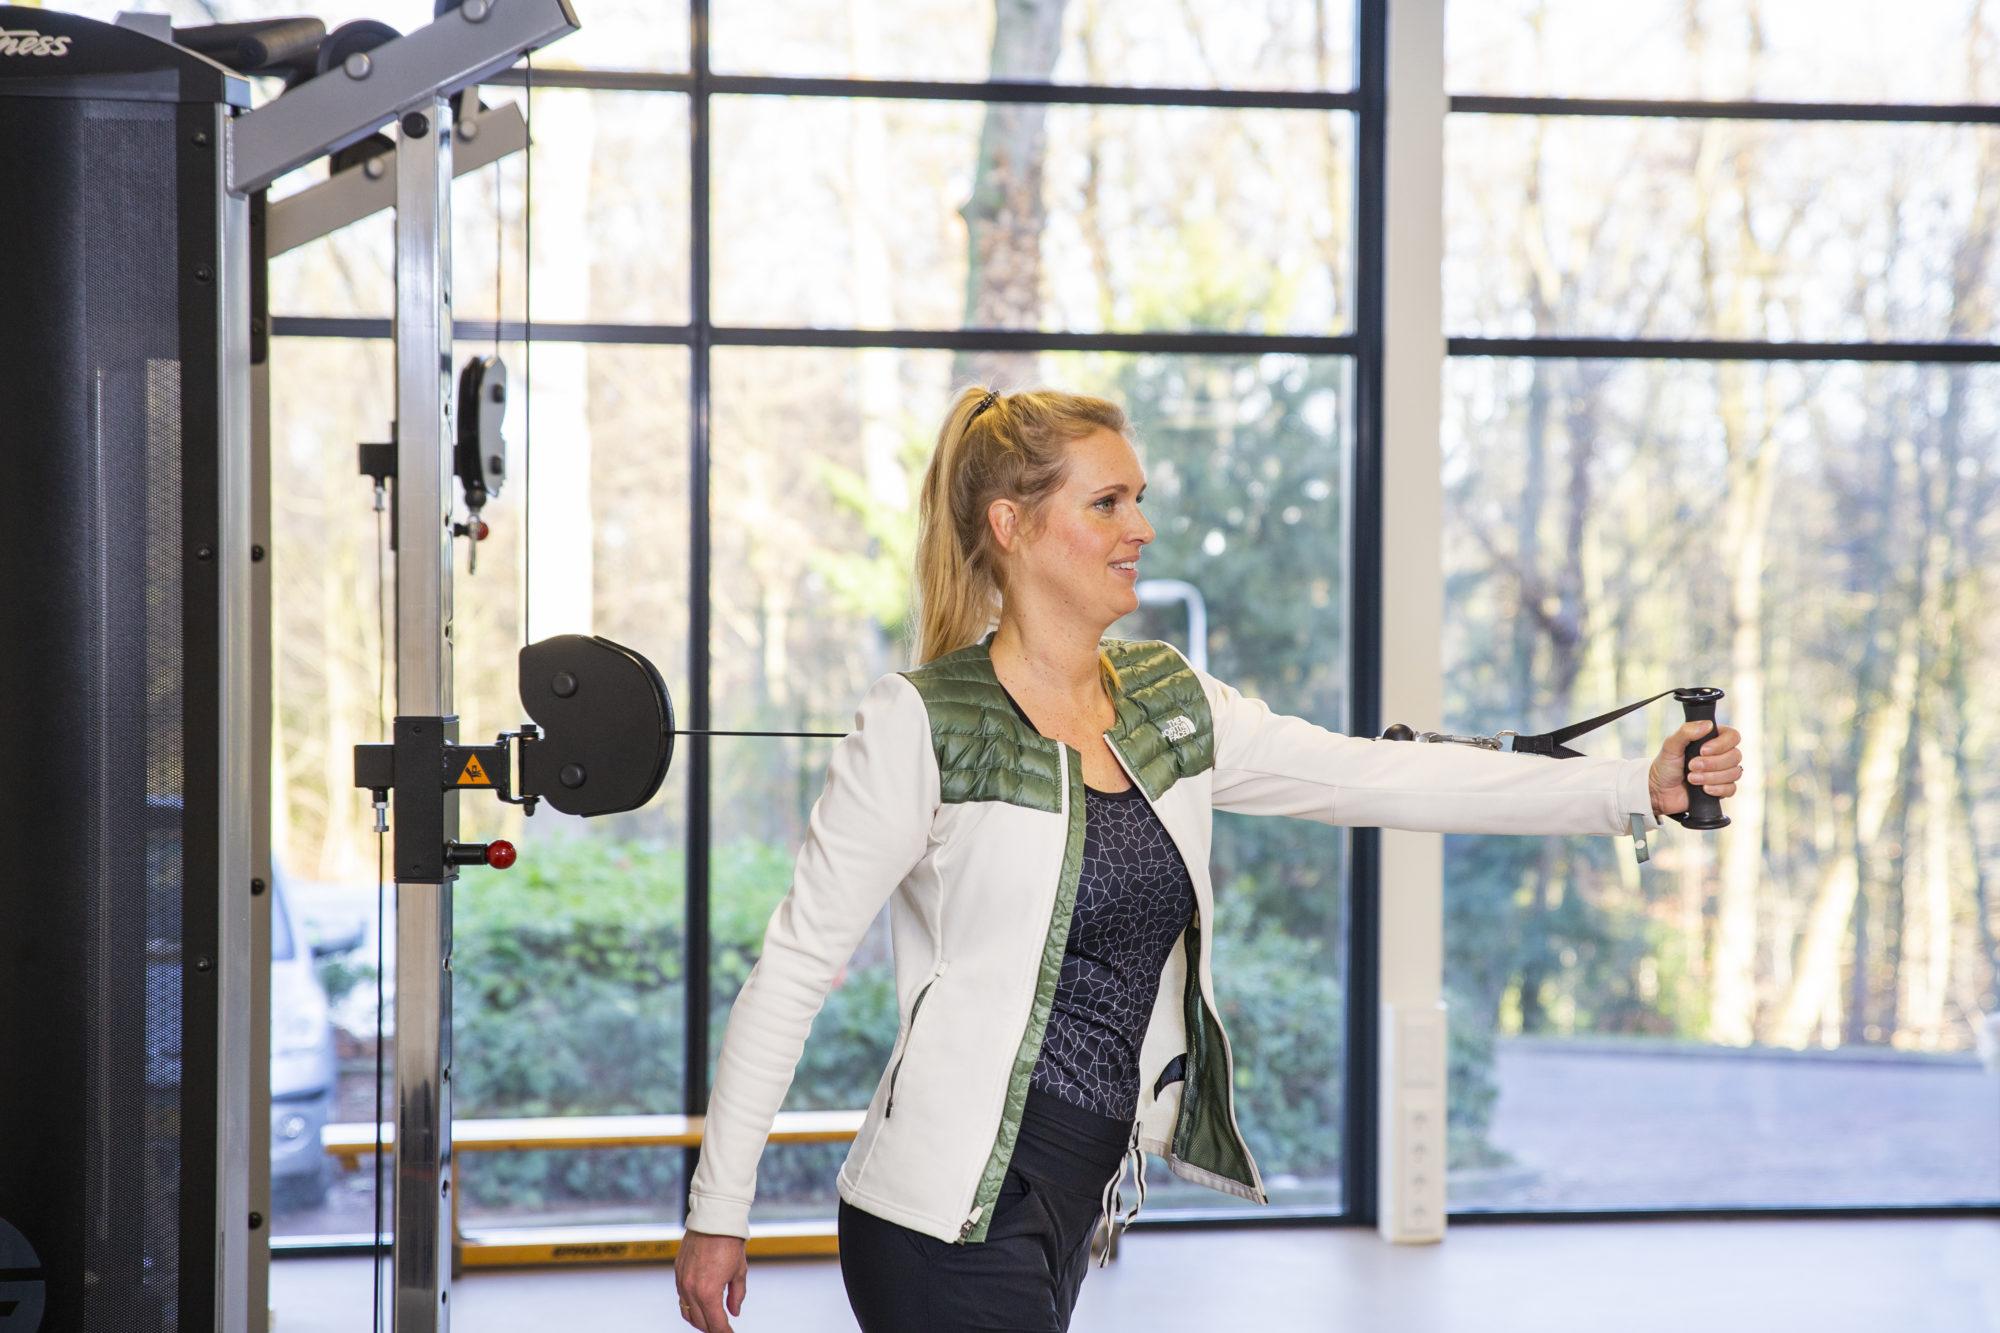 fysiotherapie-smcp 2